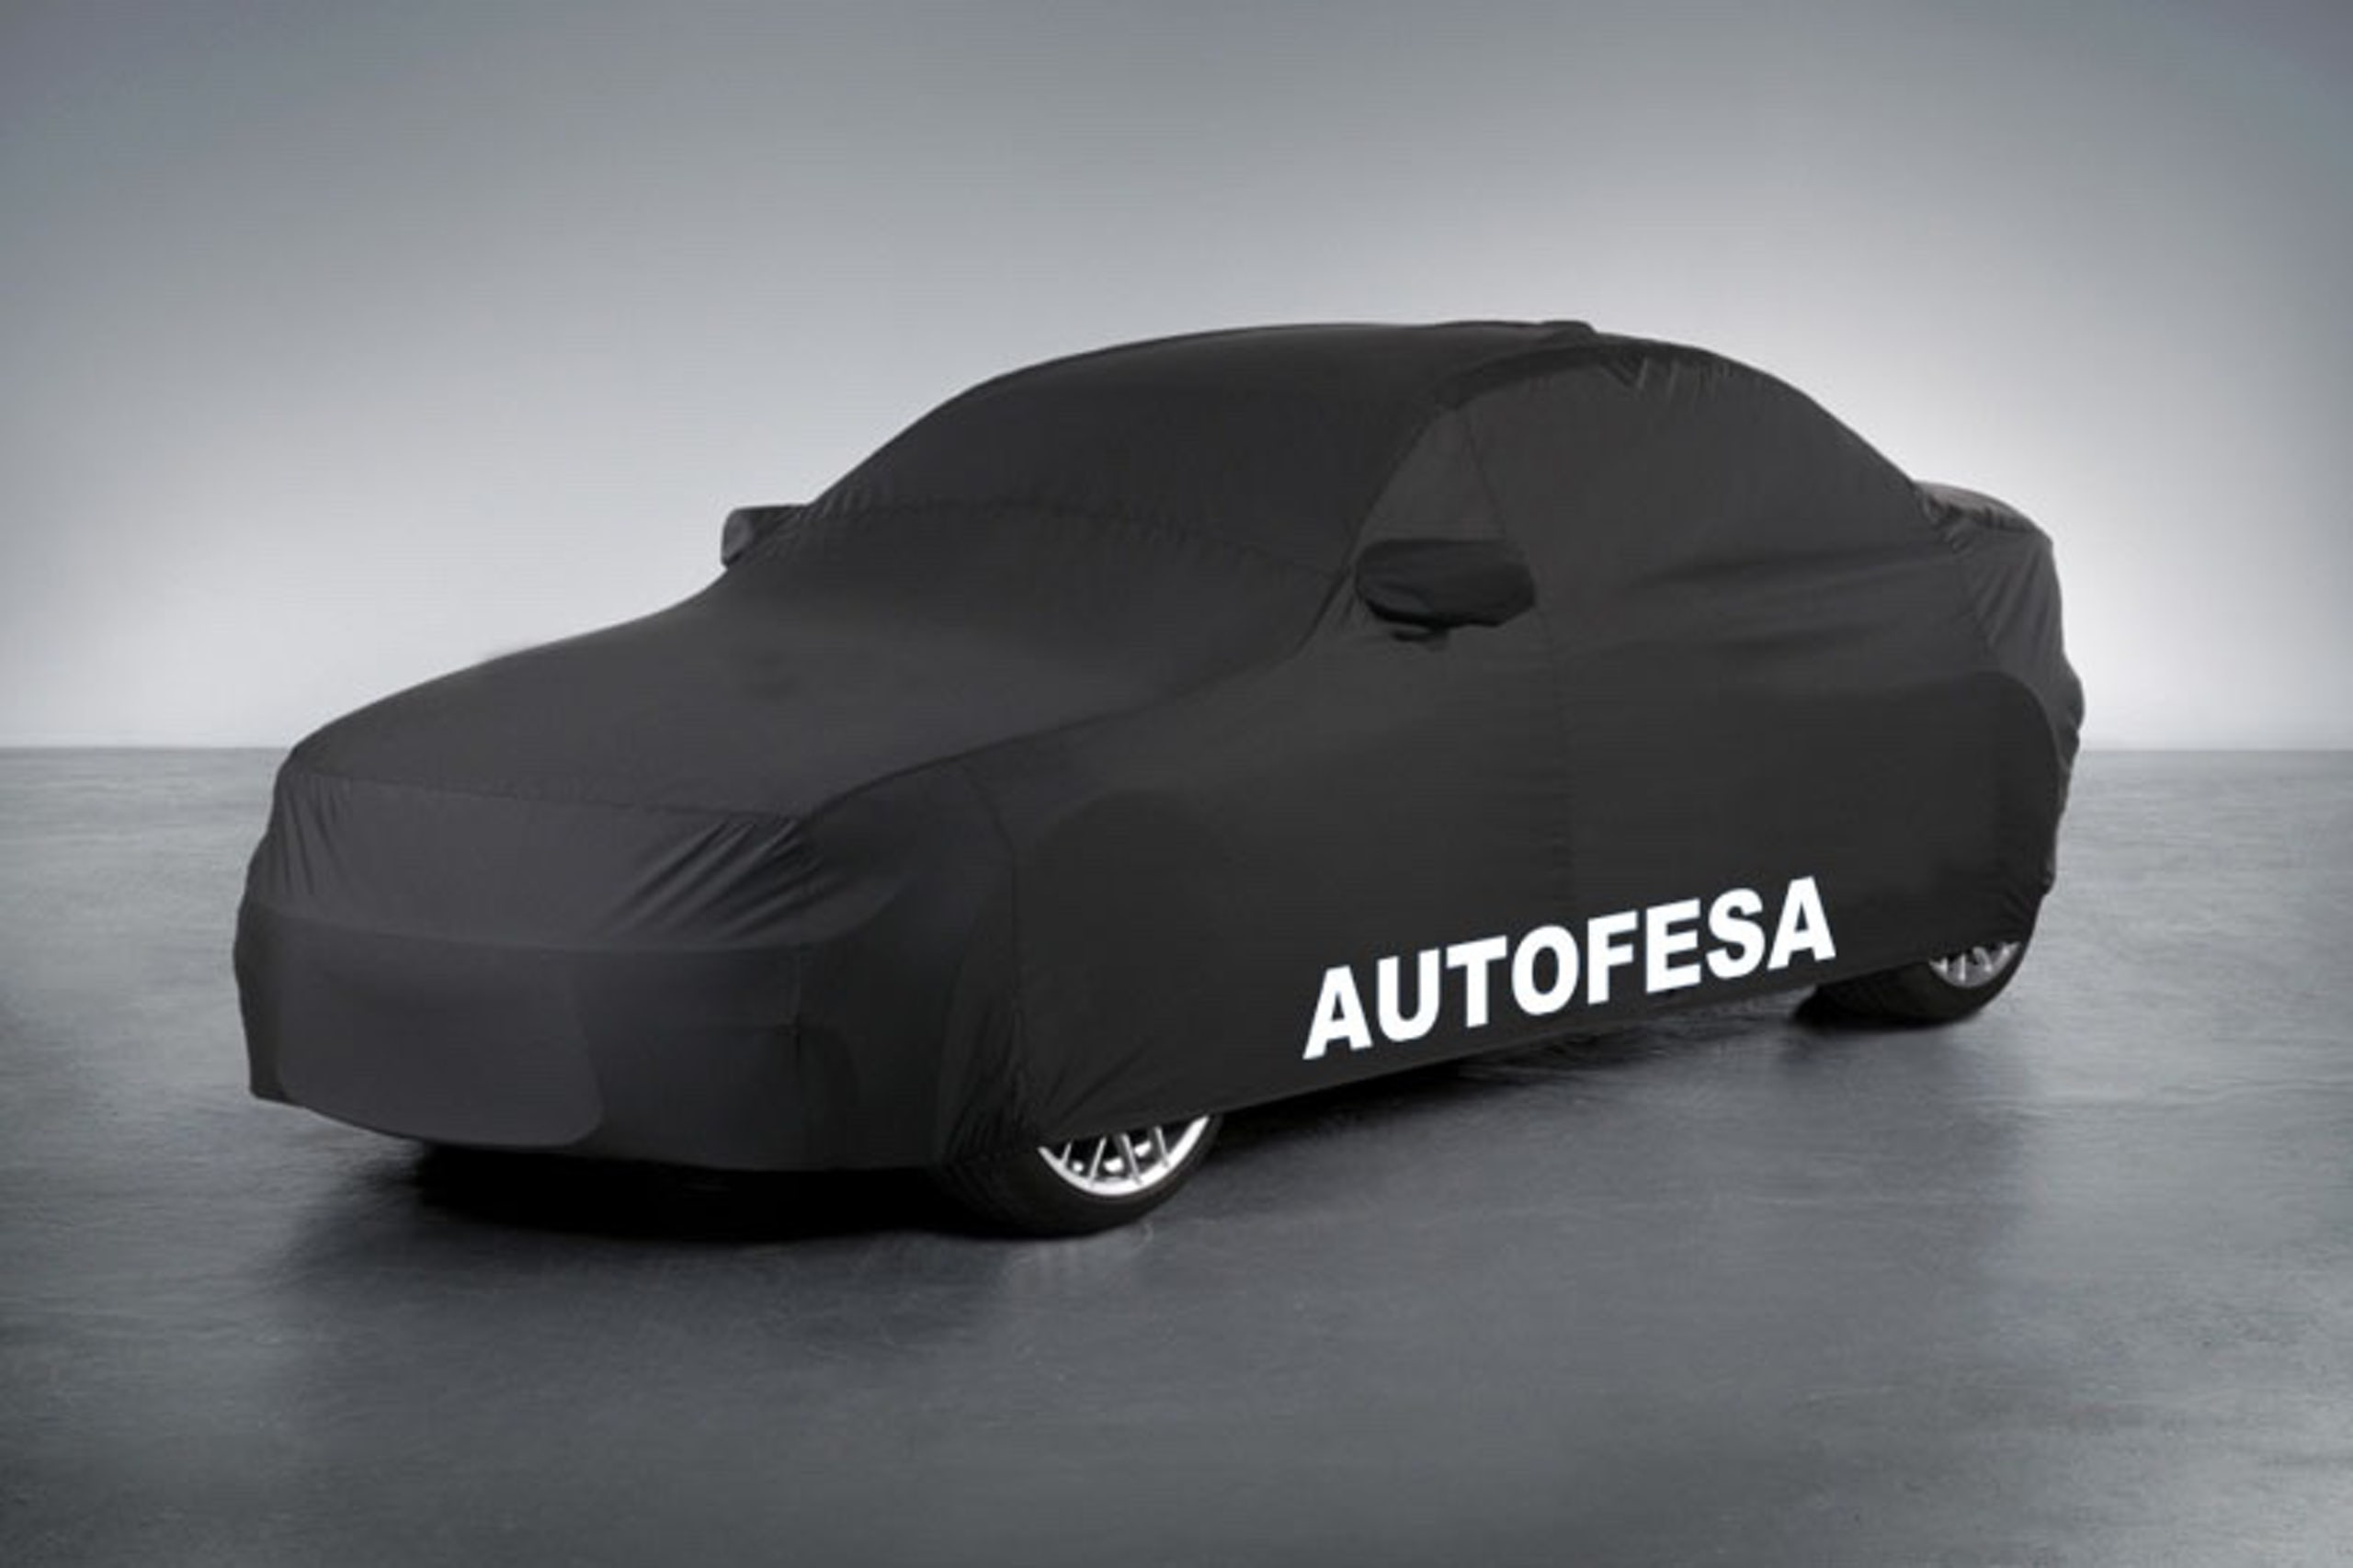 Mitsubishi Outlander 2.0 DI-D 150cv Motion 2WD 5p 7plz Auto S/S - Foto 28